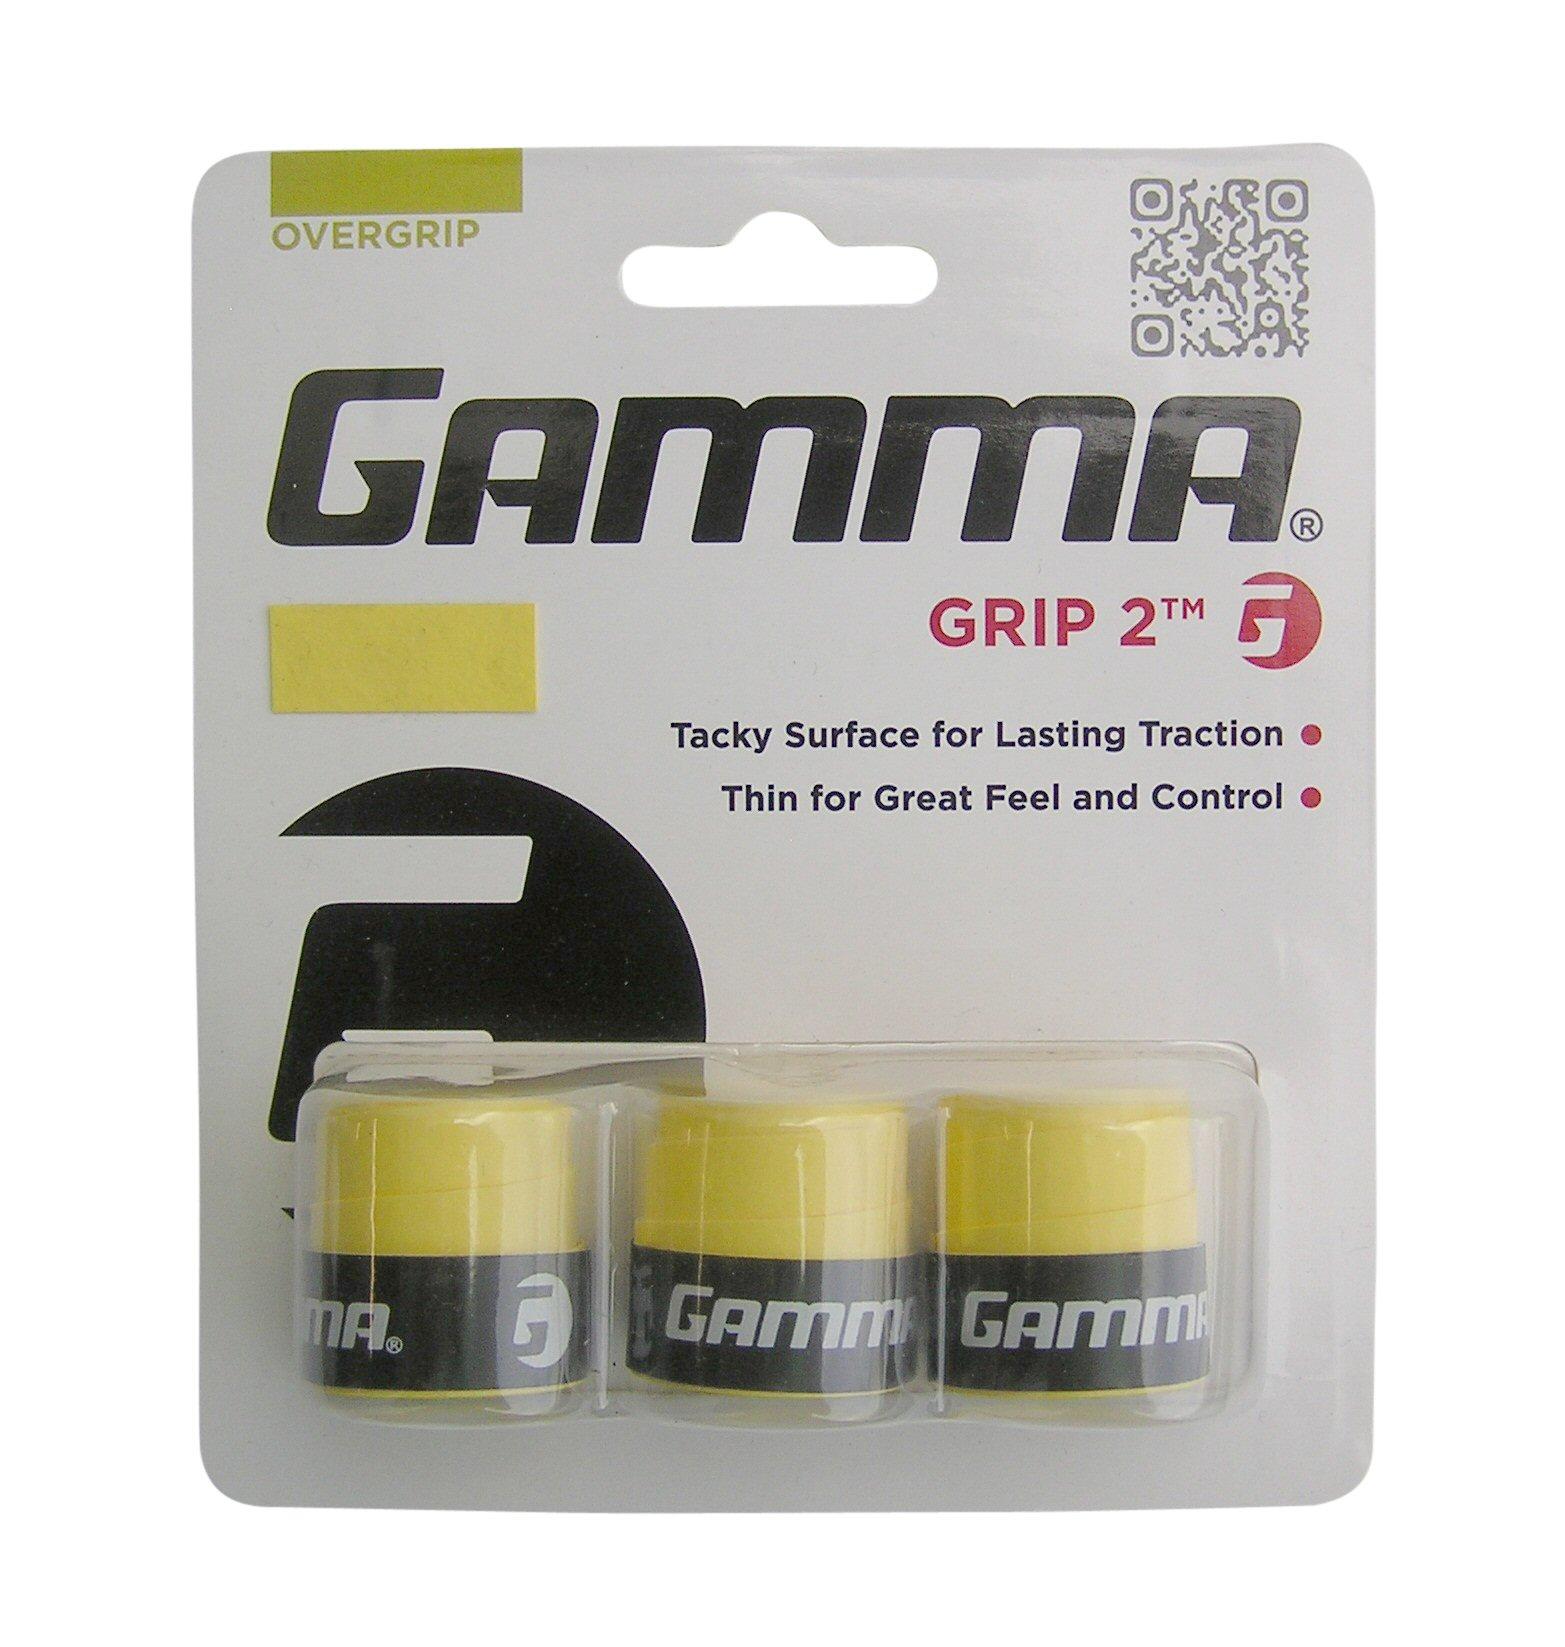 Gamma Grip 2 Overgrip 3er gelb